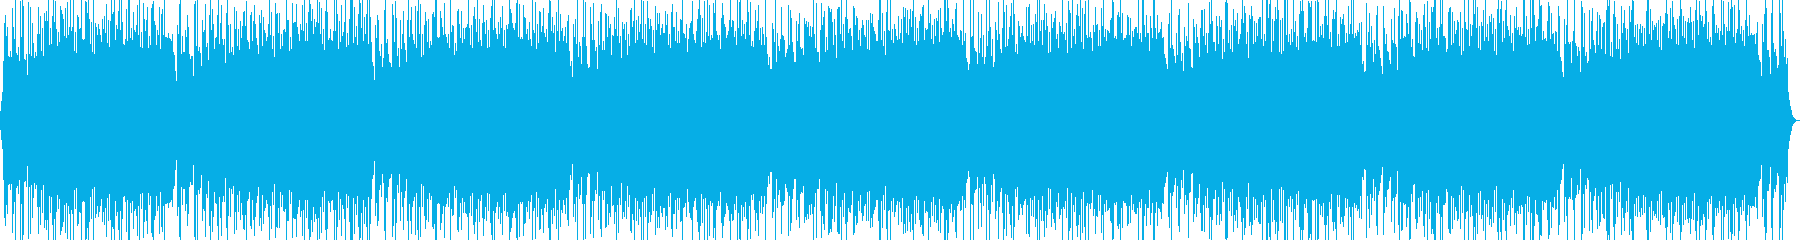 YouTube、CM、爽やかの再生済みの波形